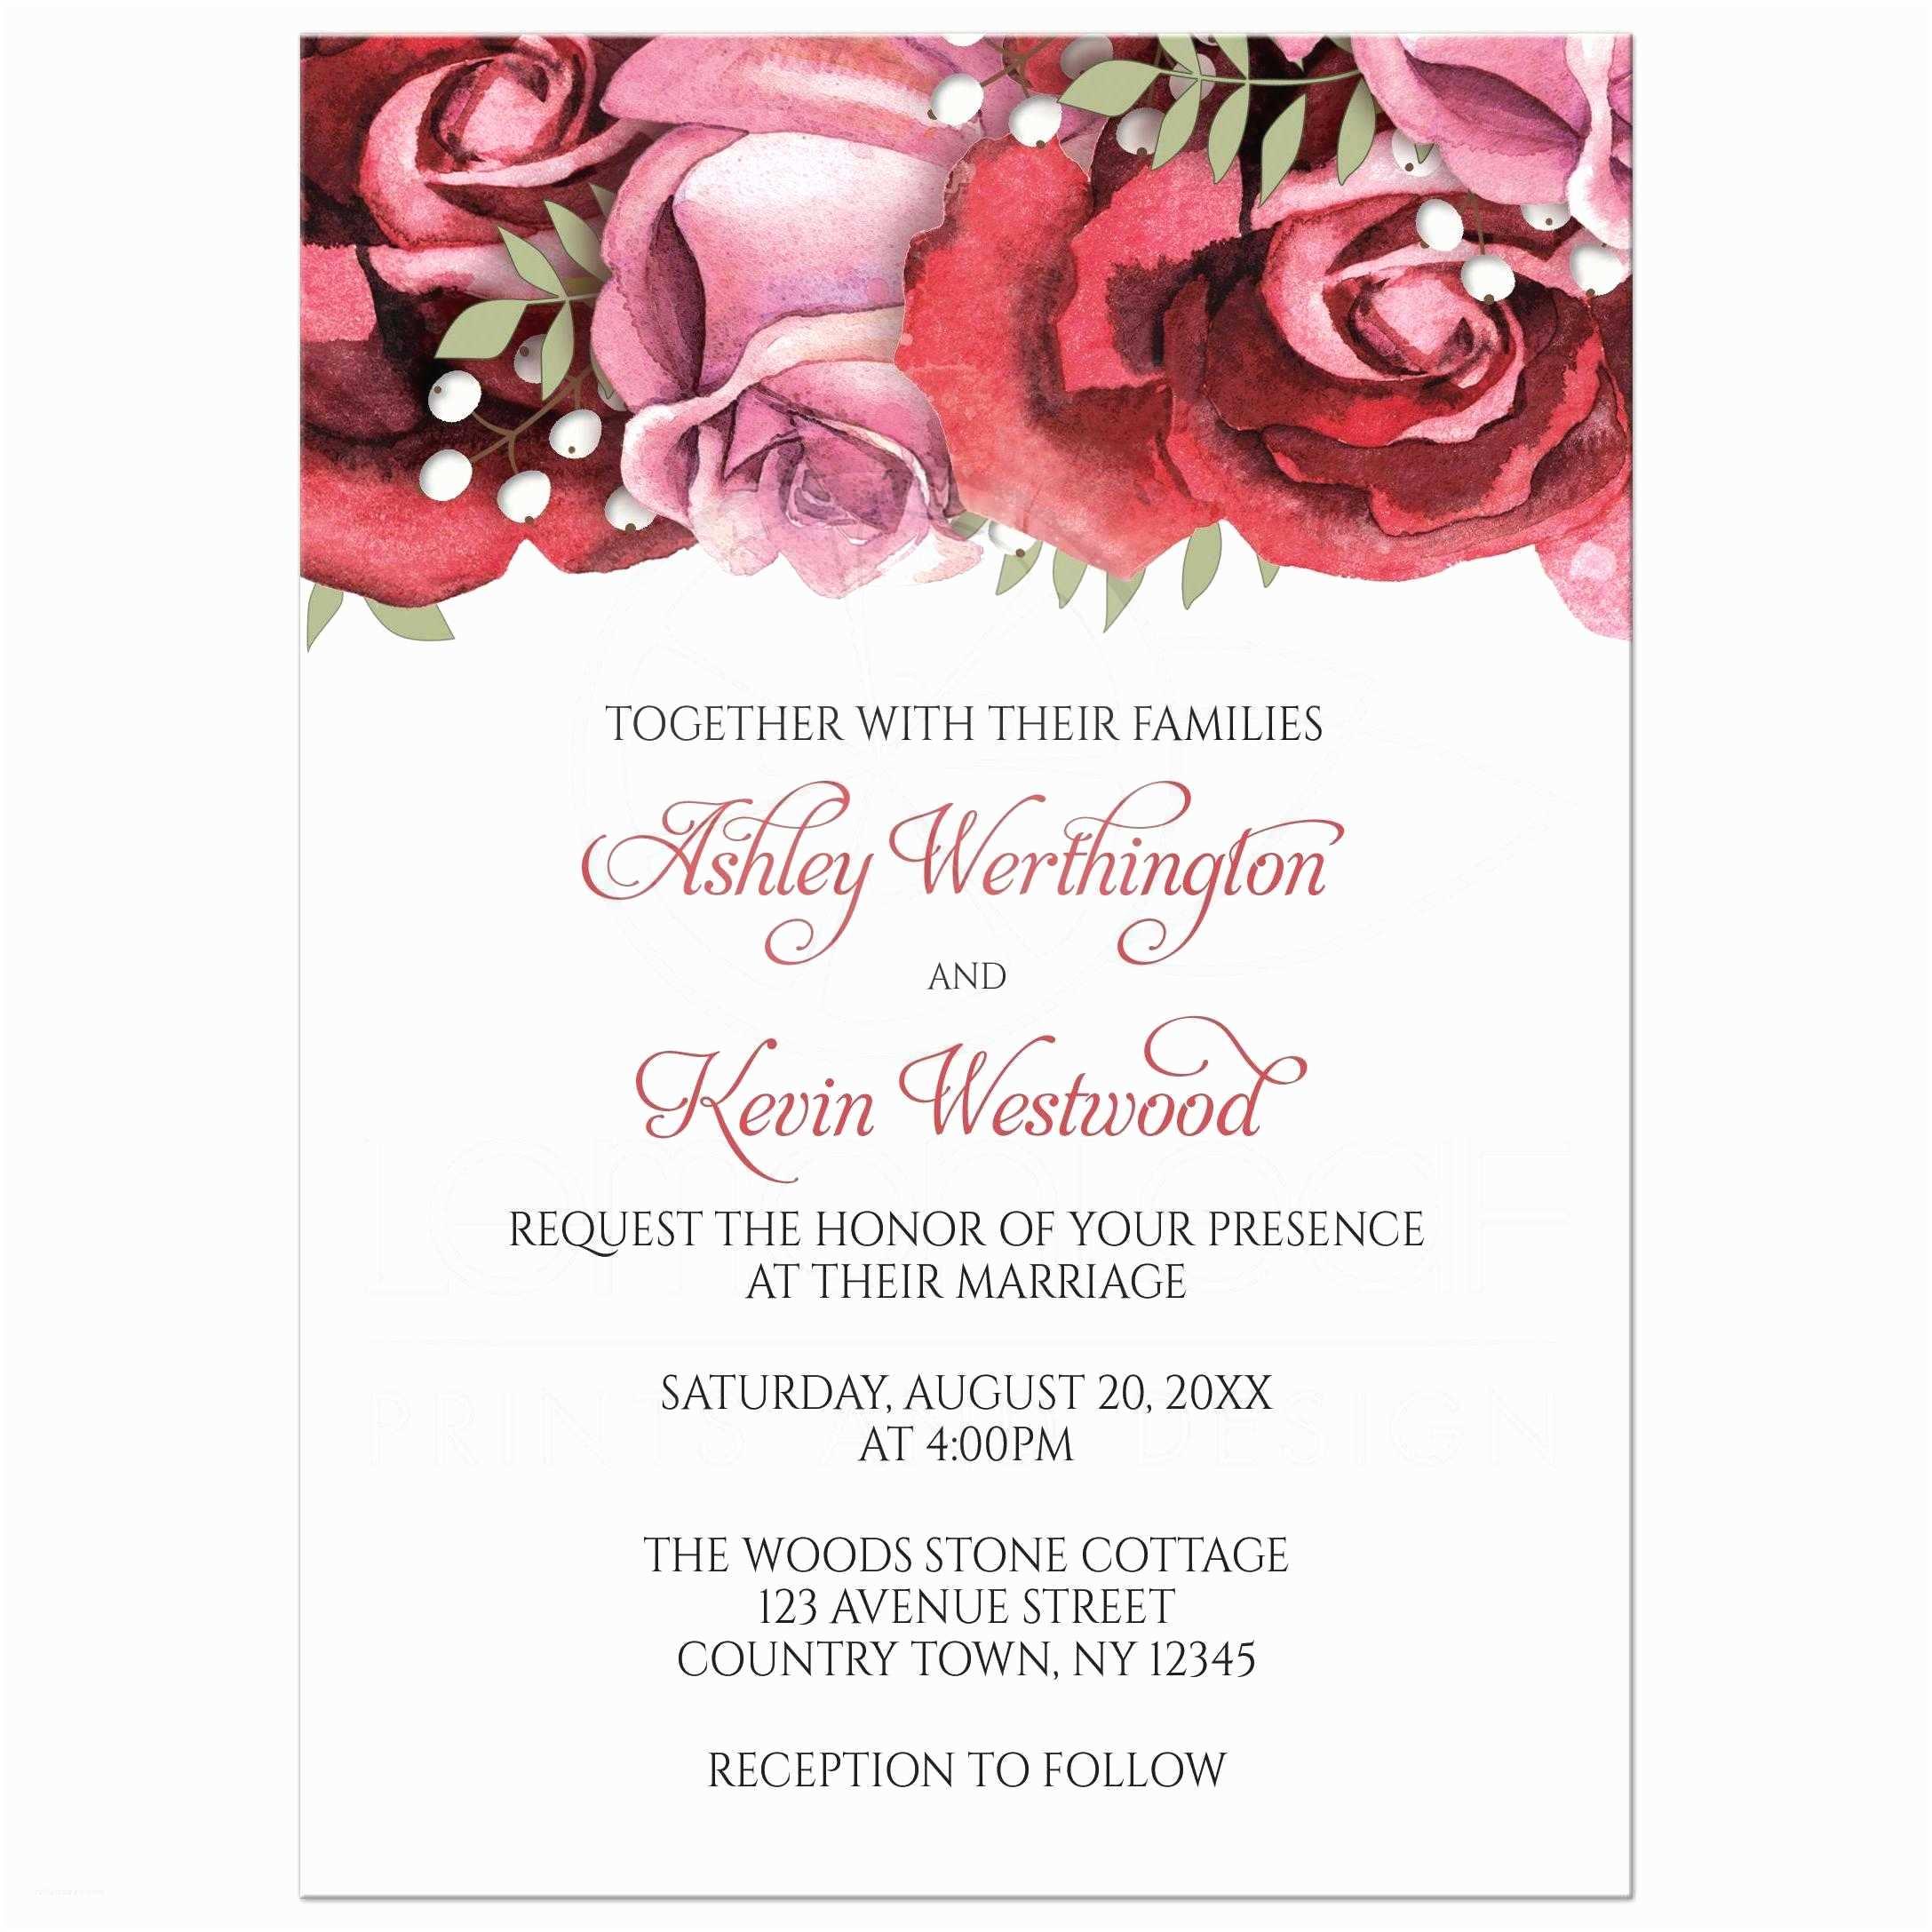 Red Rose Wedding Invitations Wedding Invitations Burgundy Red Pink Rose